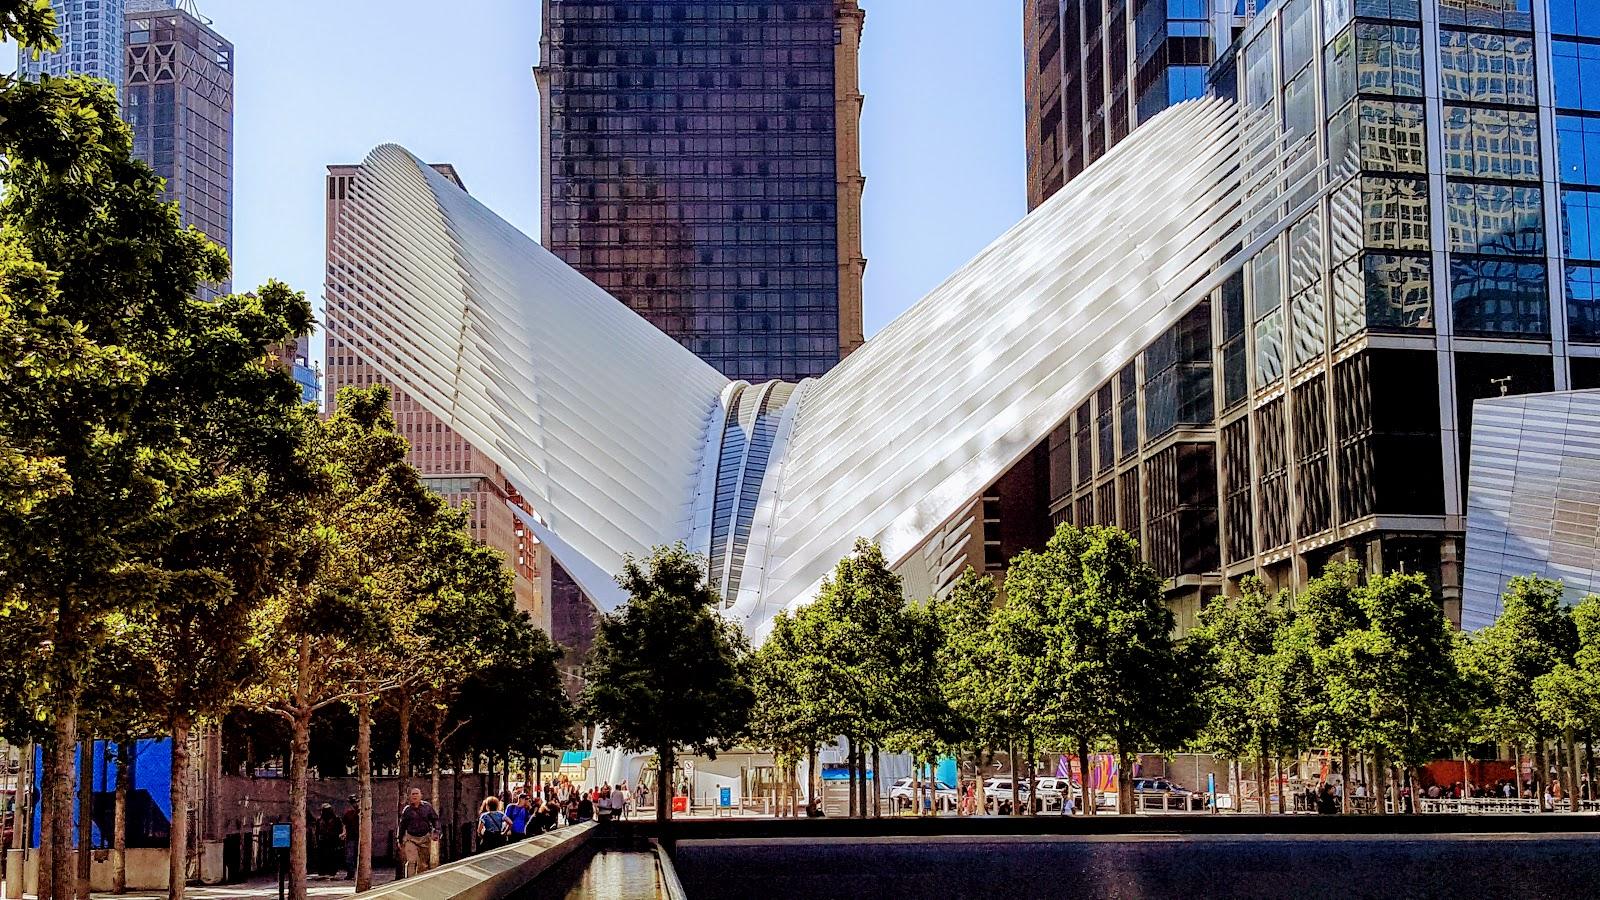 The Oculus, New York City